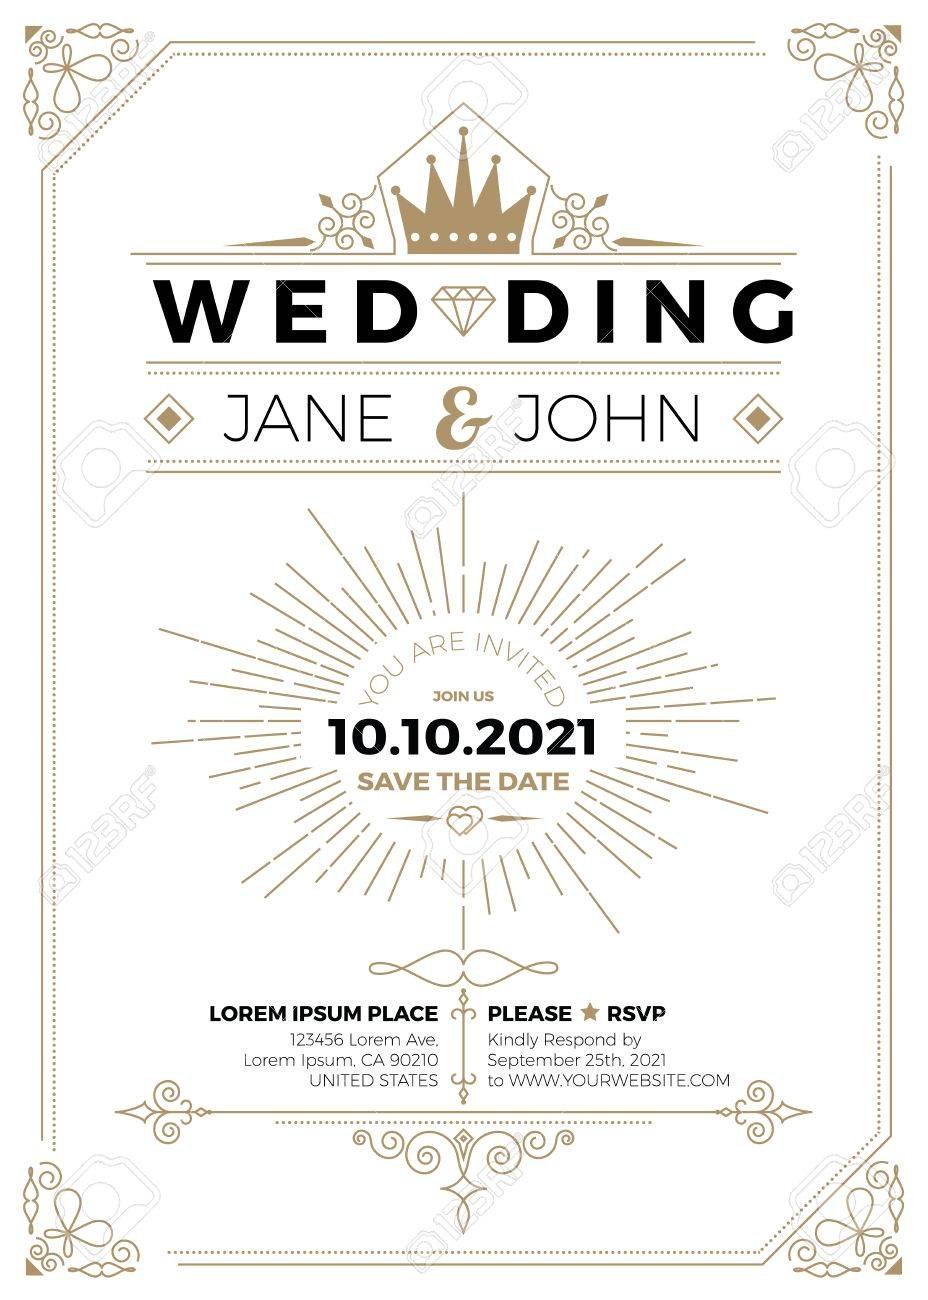 Wedding Invitation Sizes Vintage Wedding Invitation Card A Size Within Wedding Card Size Template